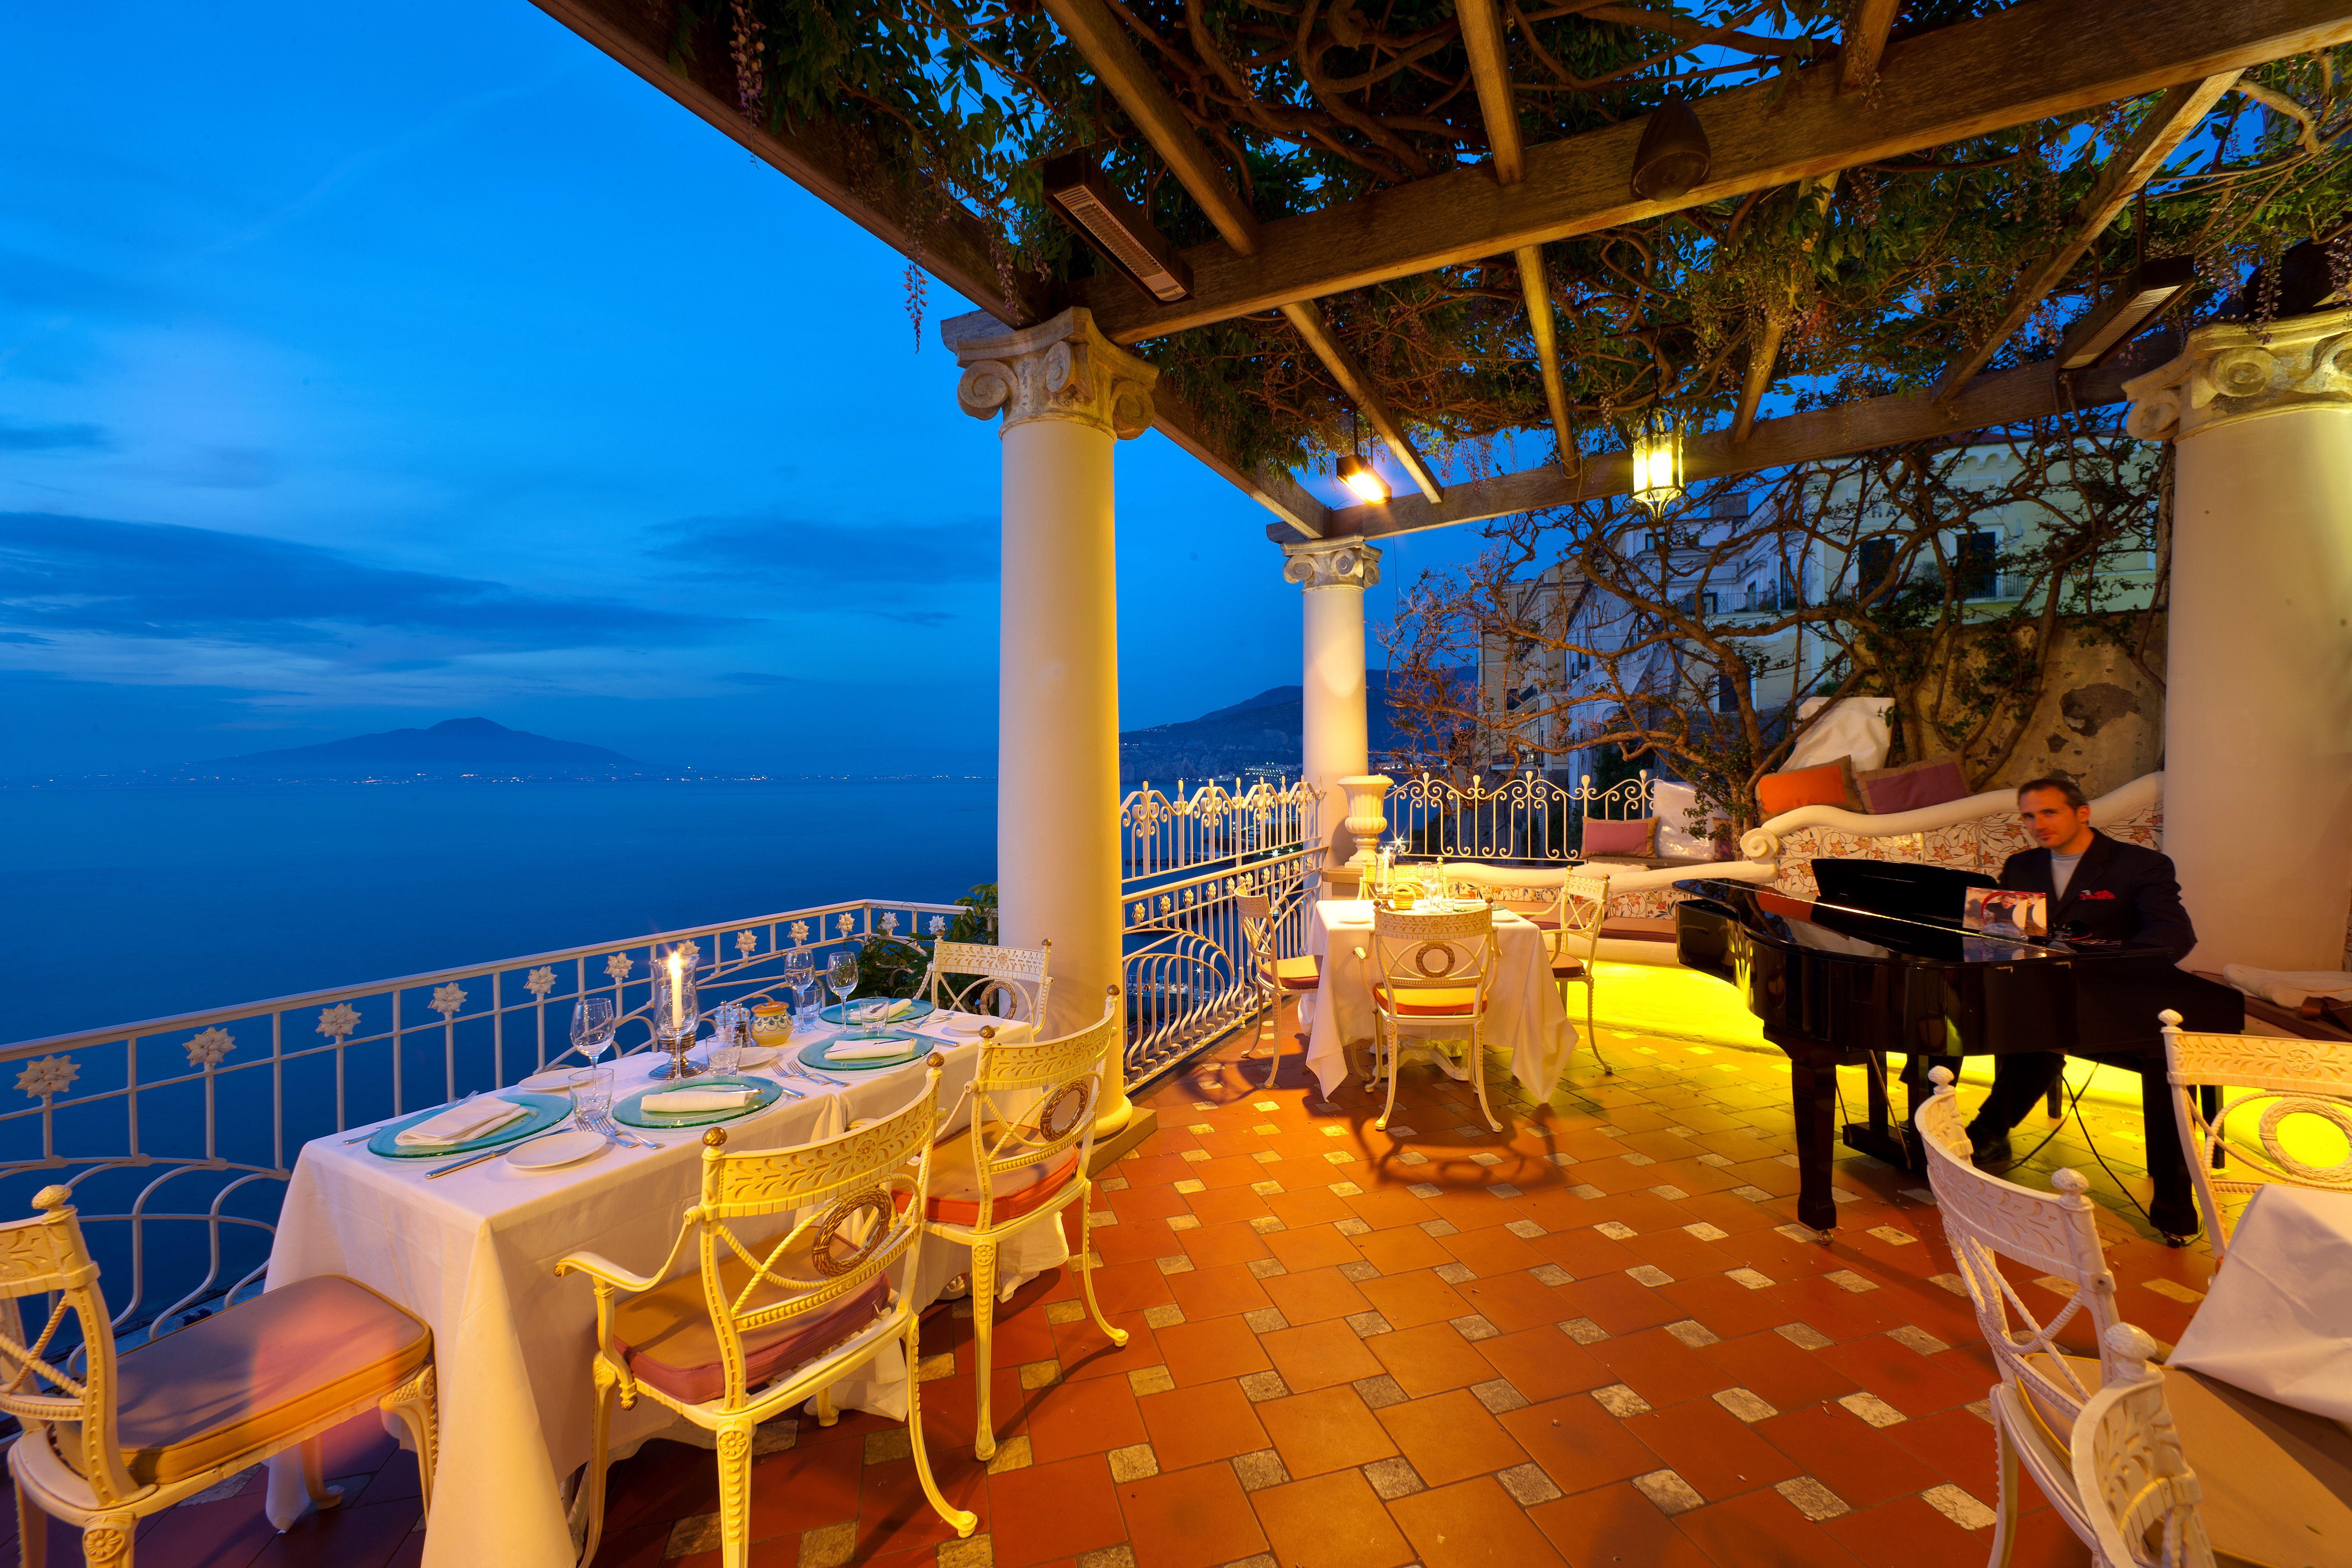 A romantic dinner in Sorrento at Bellevue's restaurant